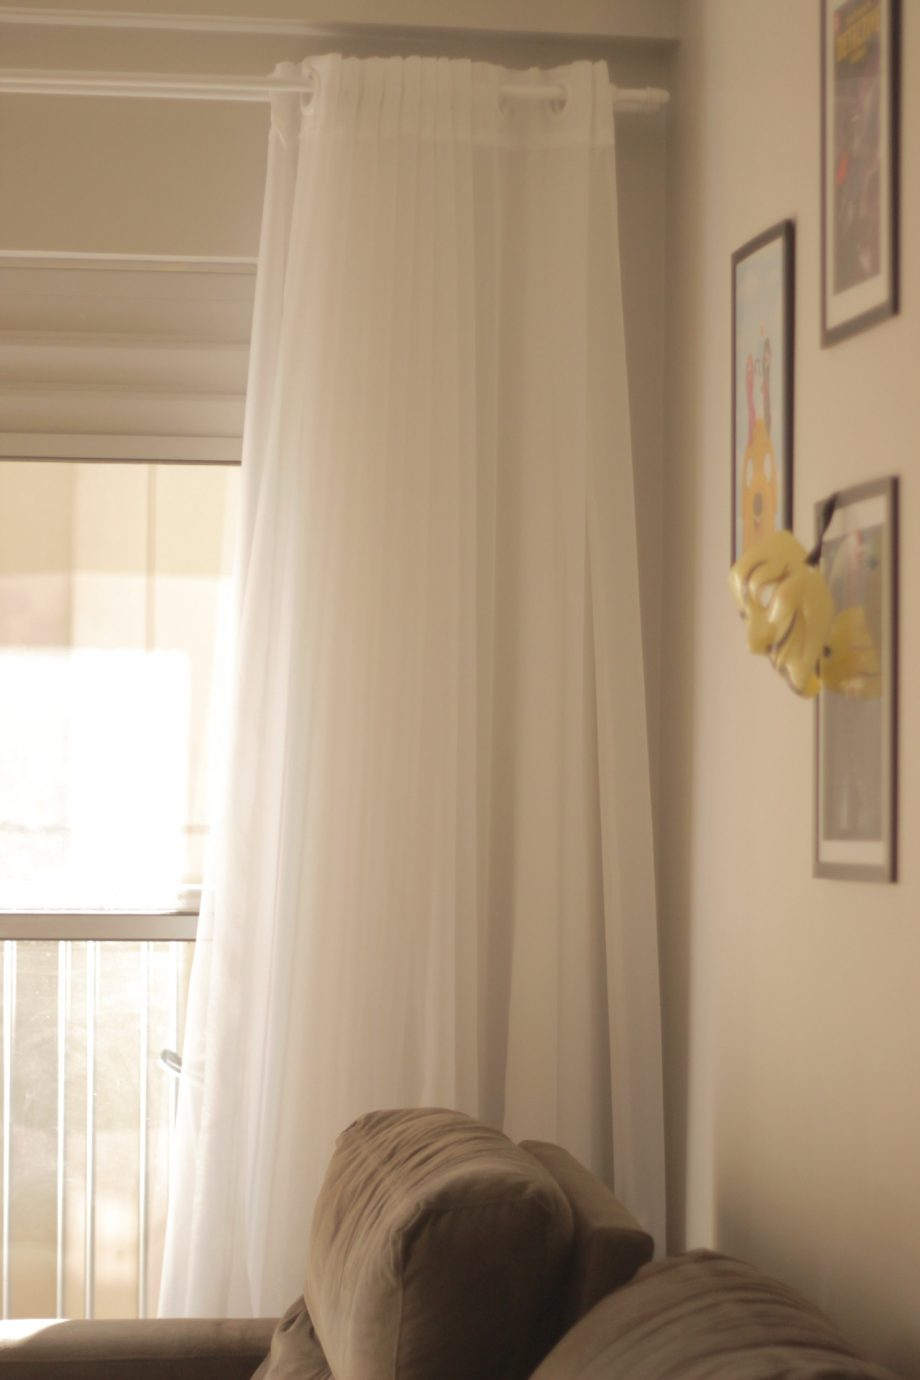 cortina-eu-costurei-cortina-da-sala-branca-ate-o-chao-sacada-varanda